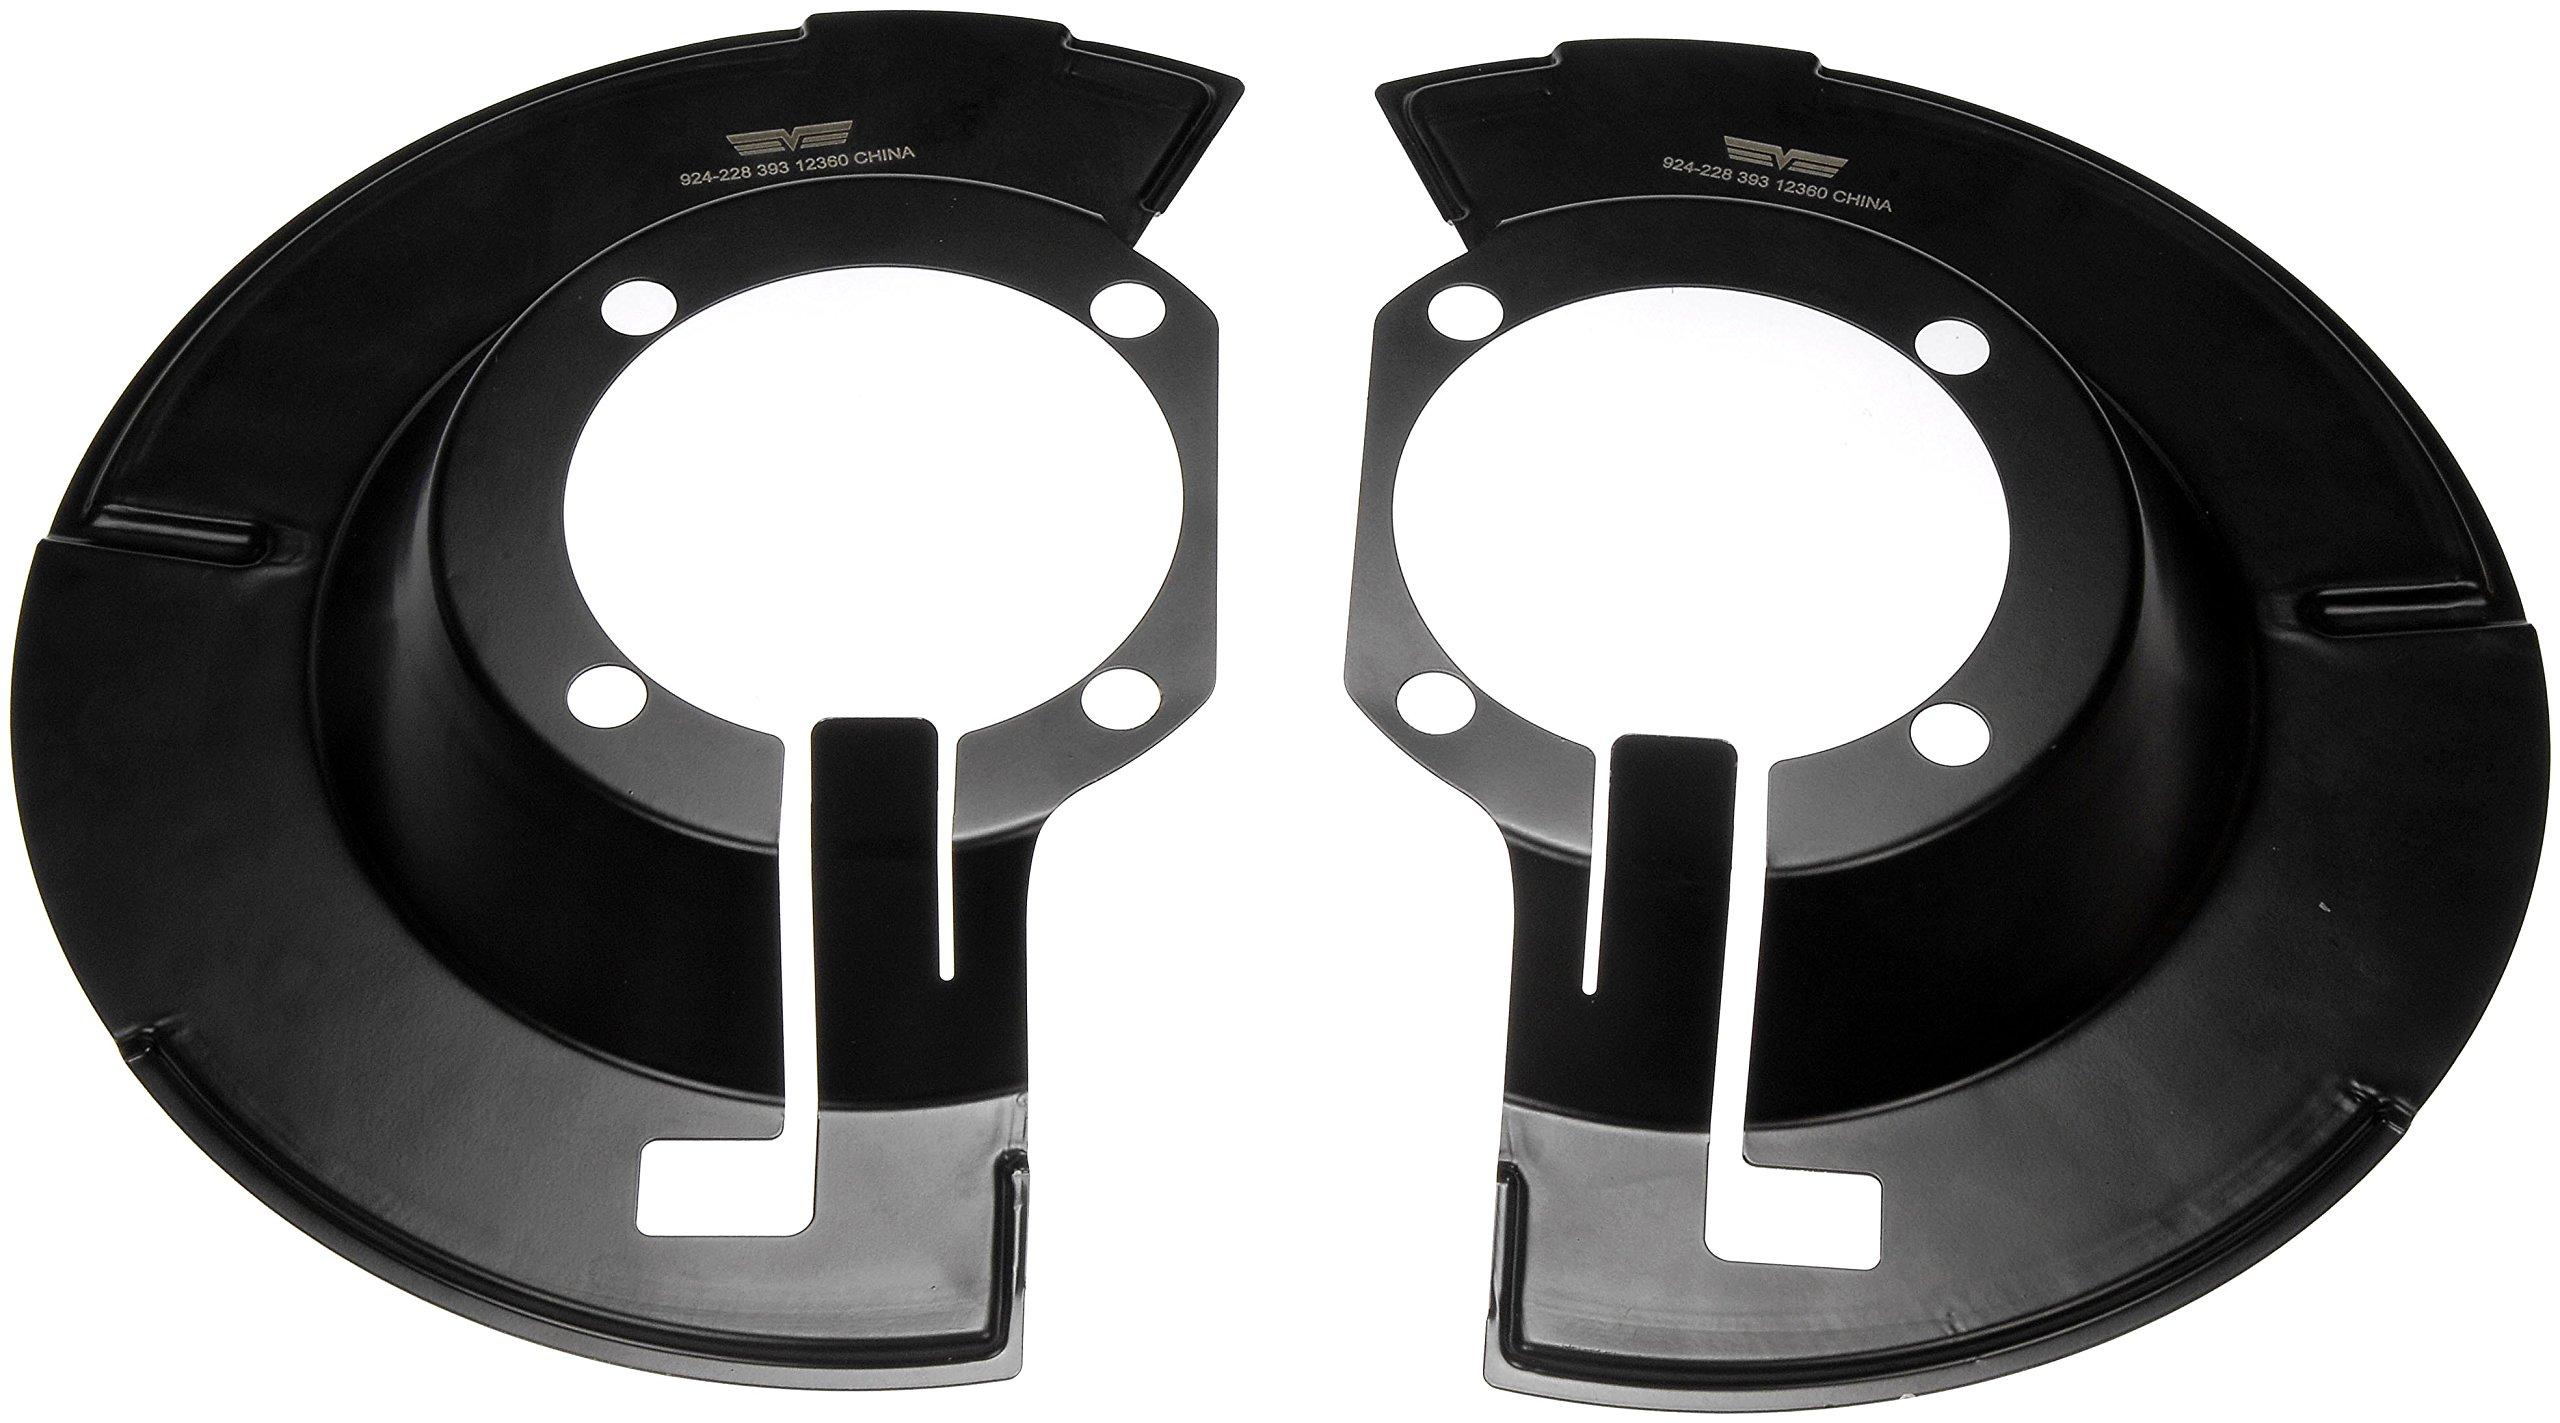 Dorman 924-228 Brake Dust Shield, Pair